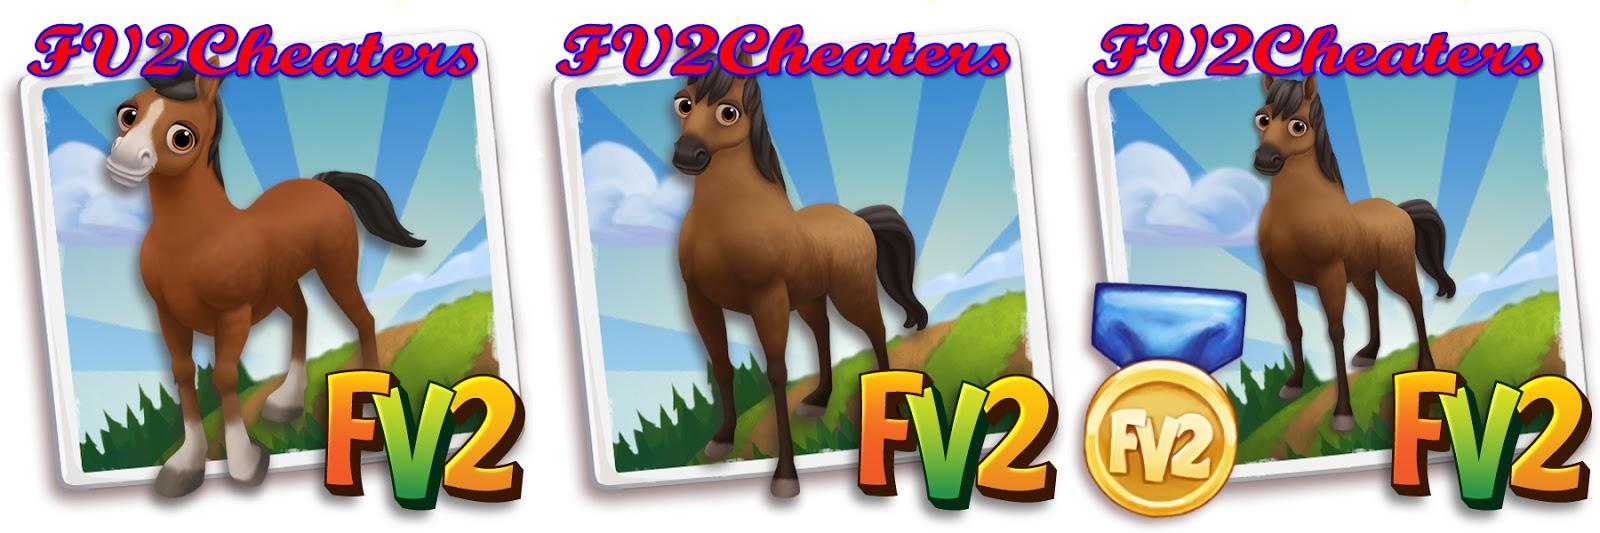 Attractive Farmville Horse #8: Farmville 2 Cheat Code For Canadian Horse